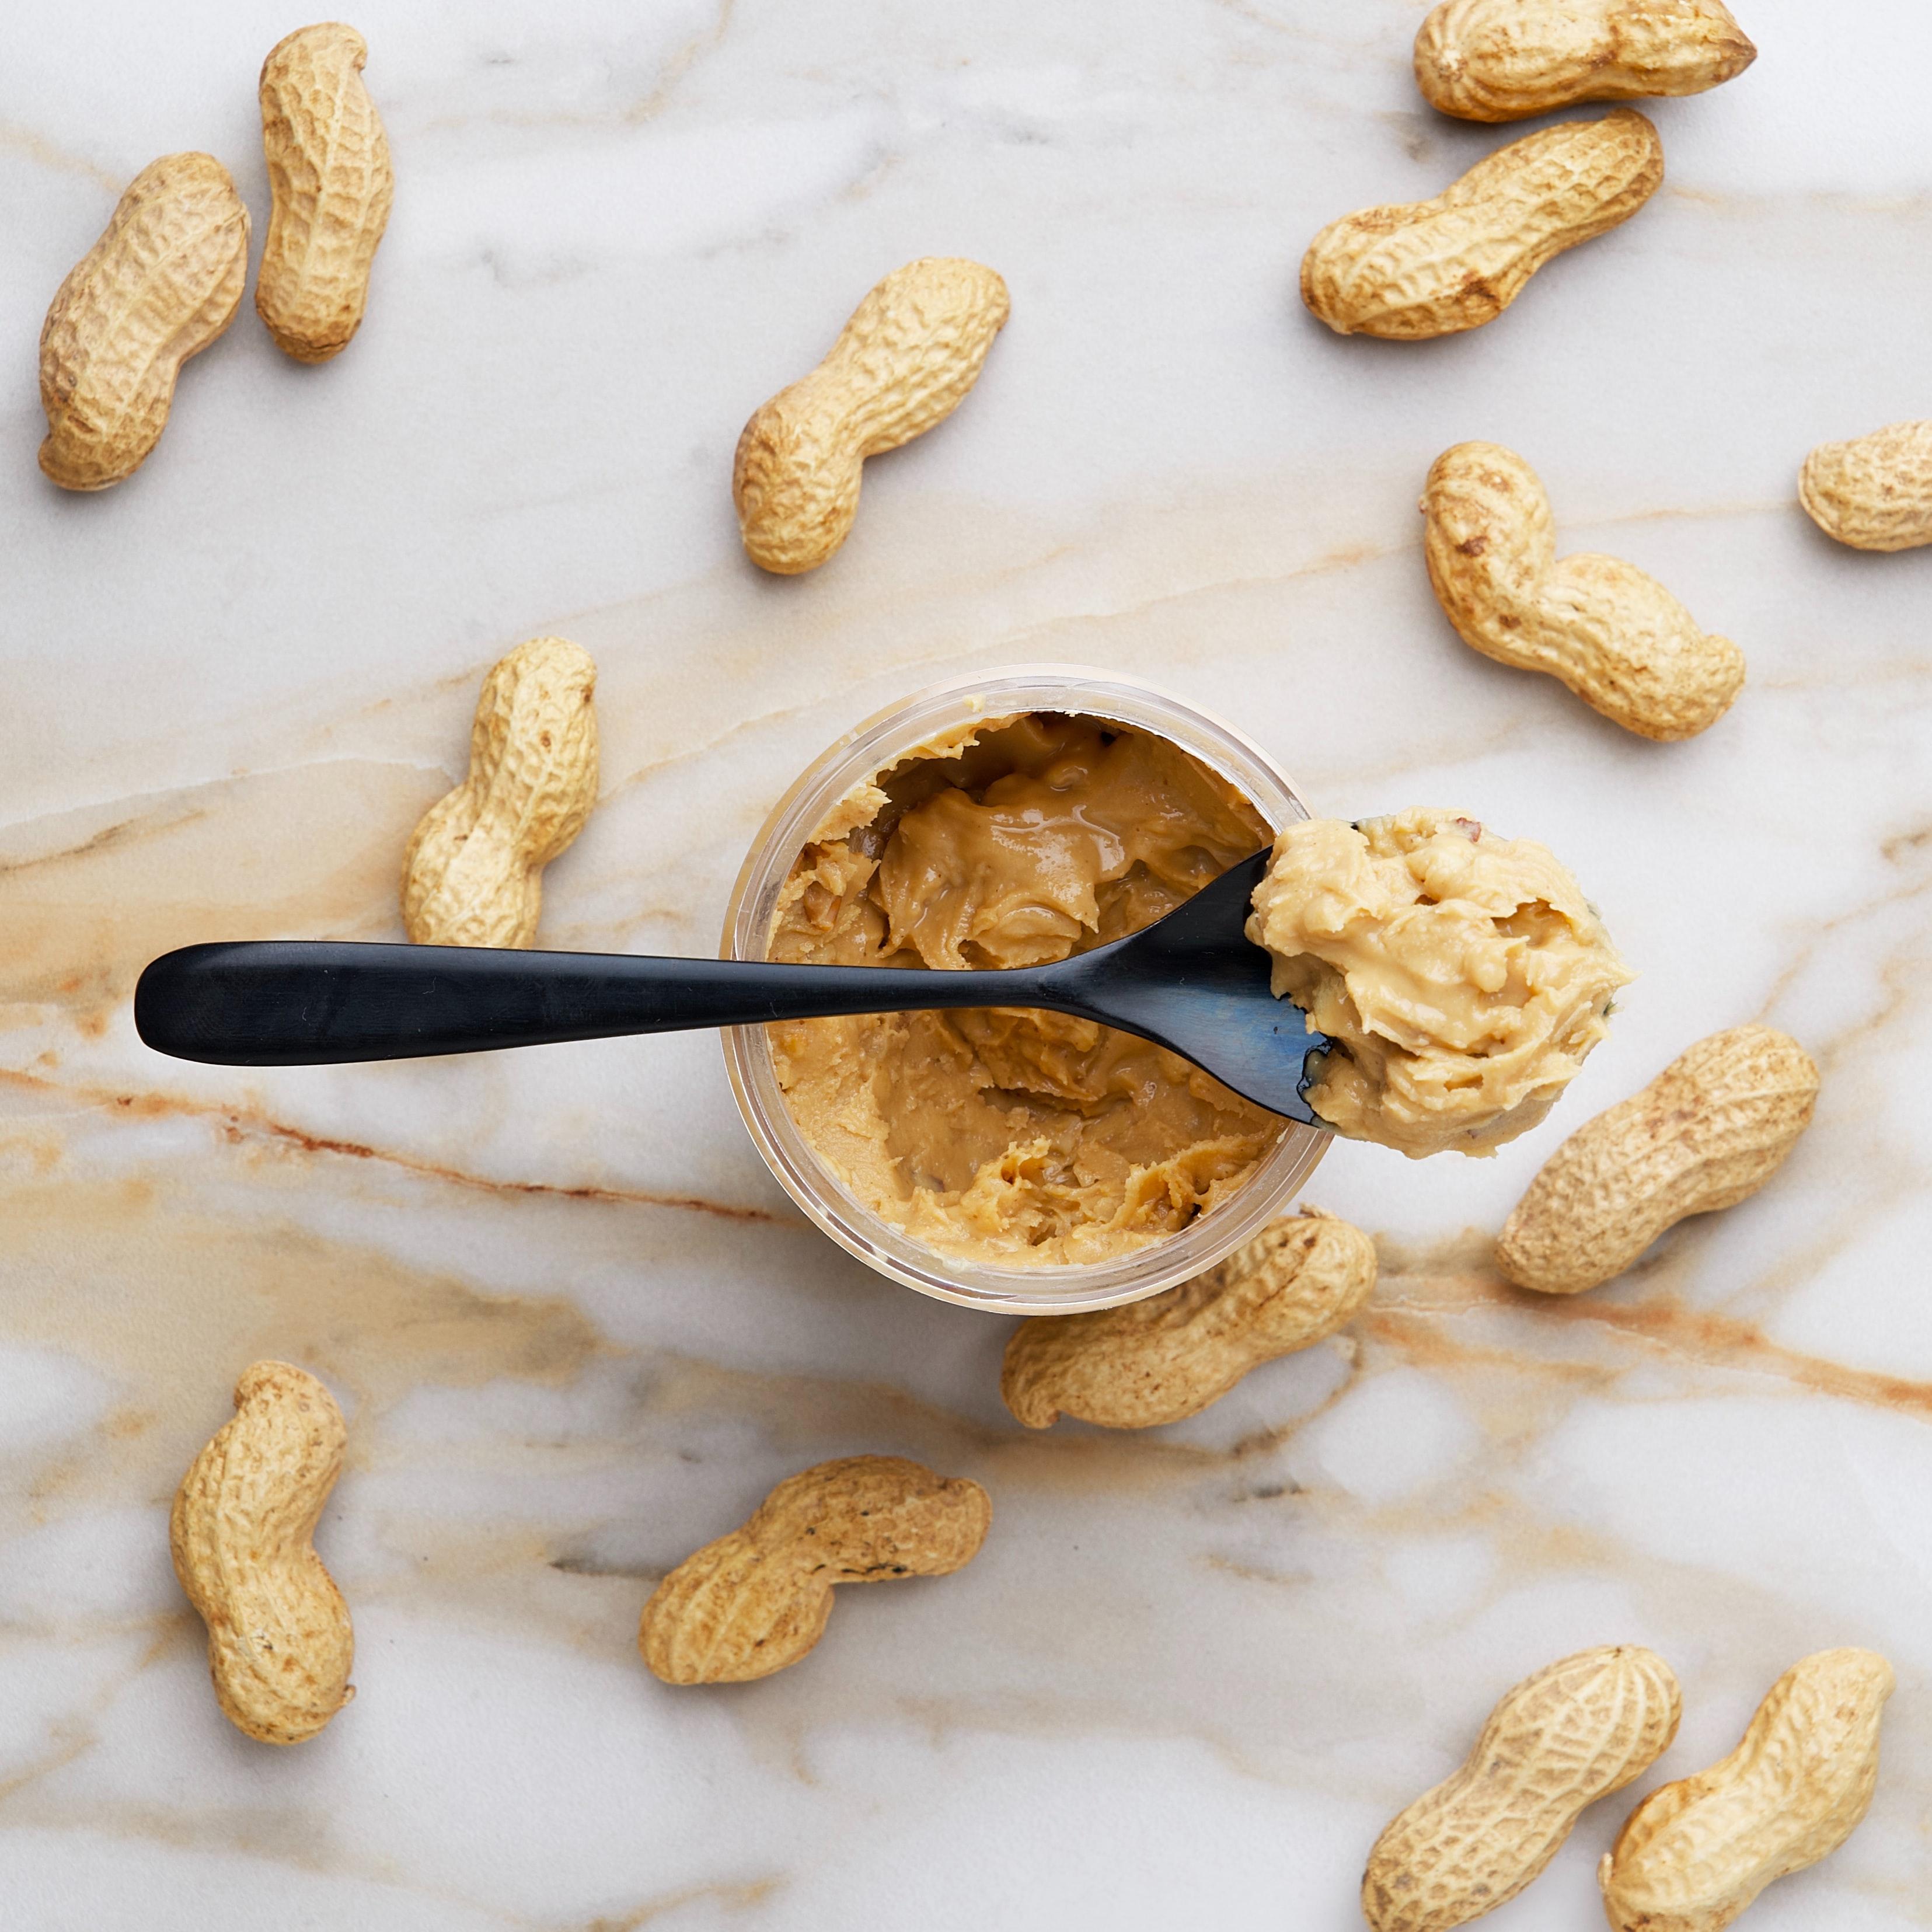 corleto-peanut-butter-u256GzFi7Gw-unsplashjpg